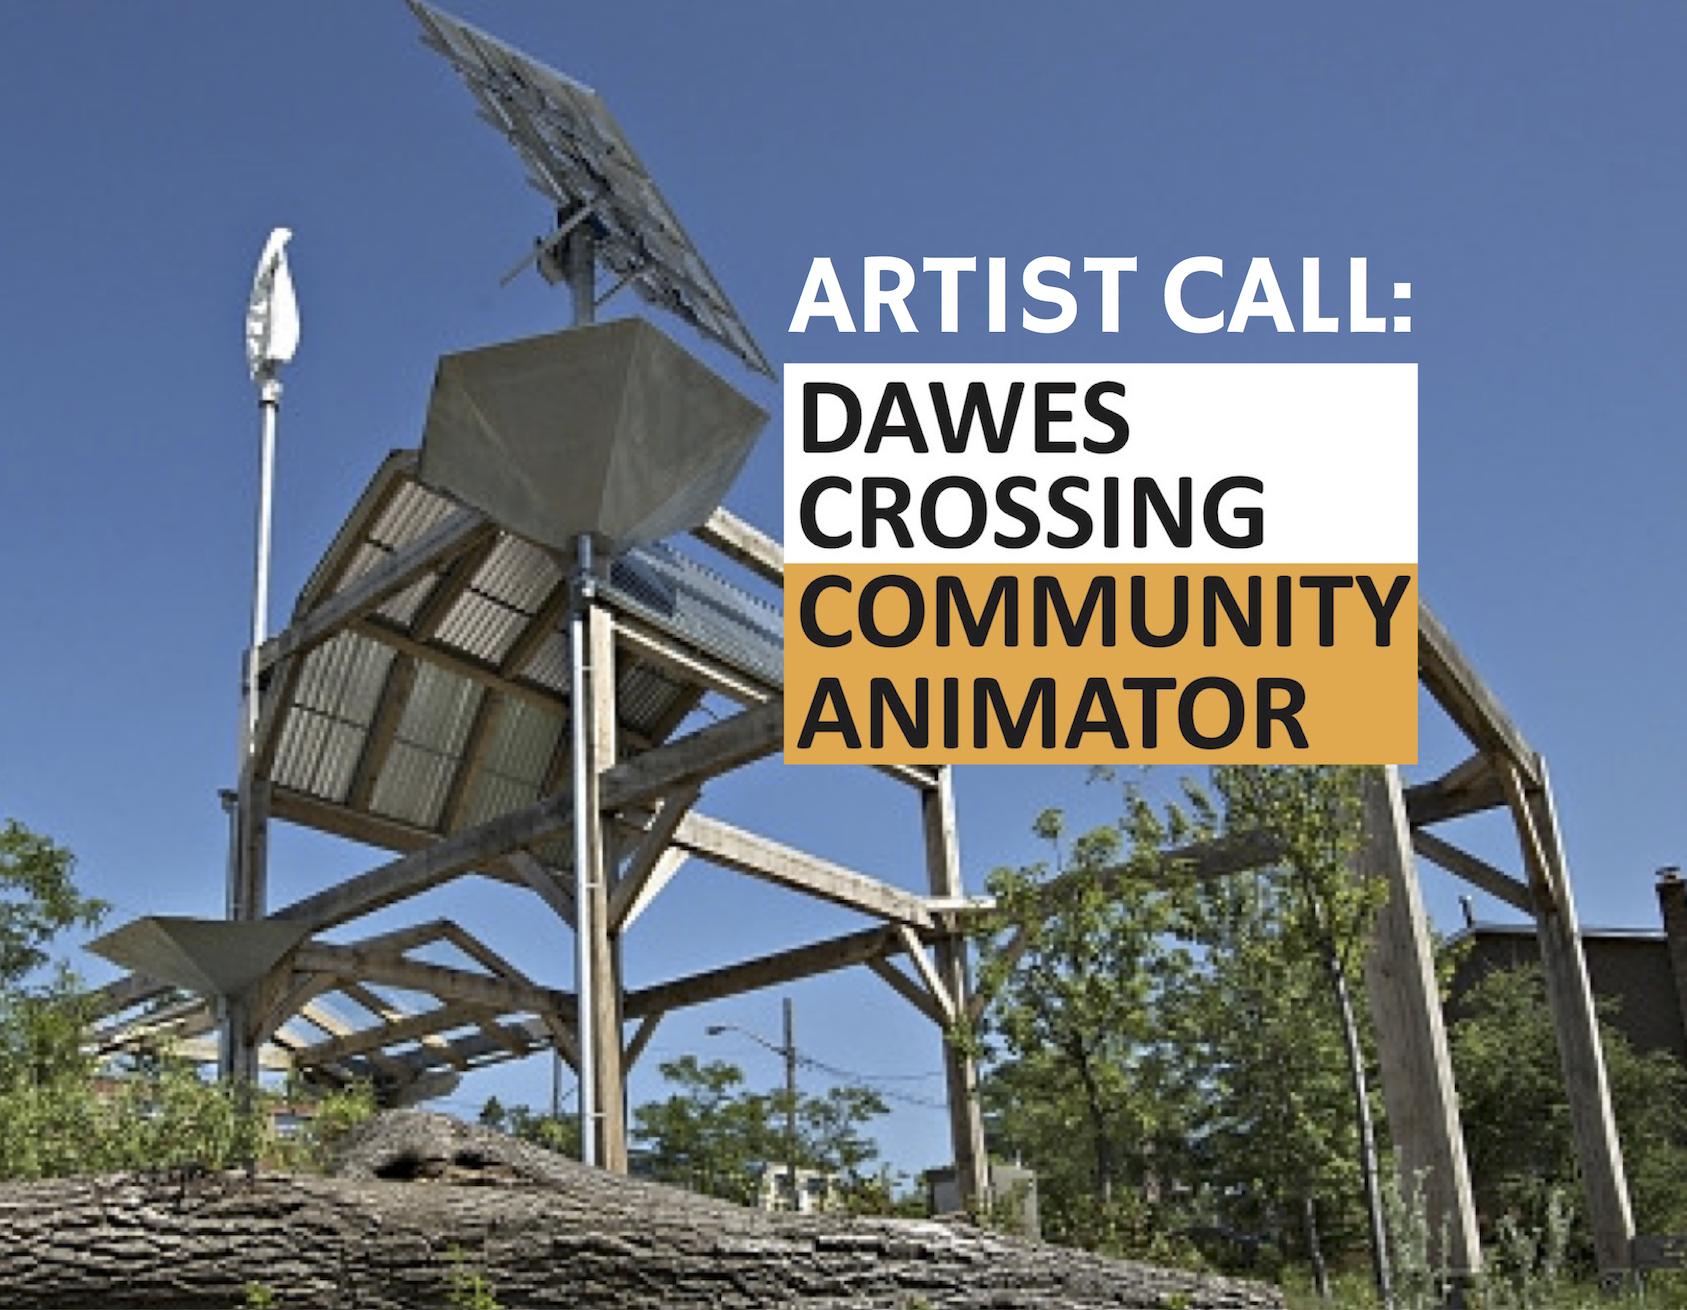 Artist Call: Dawes Crossing Community Animator